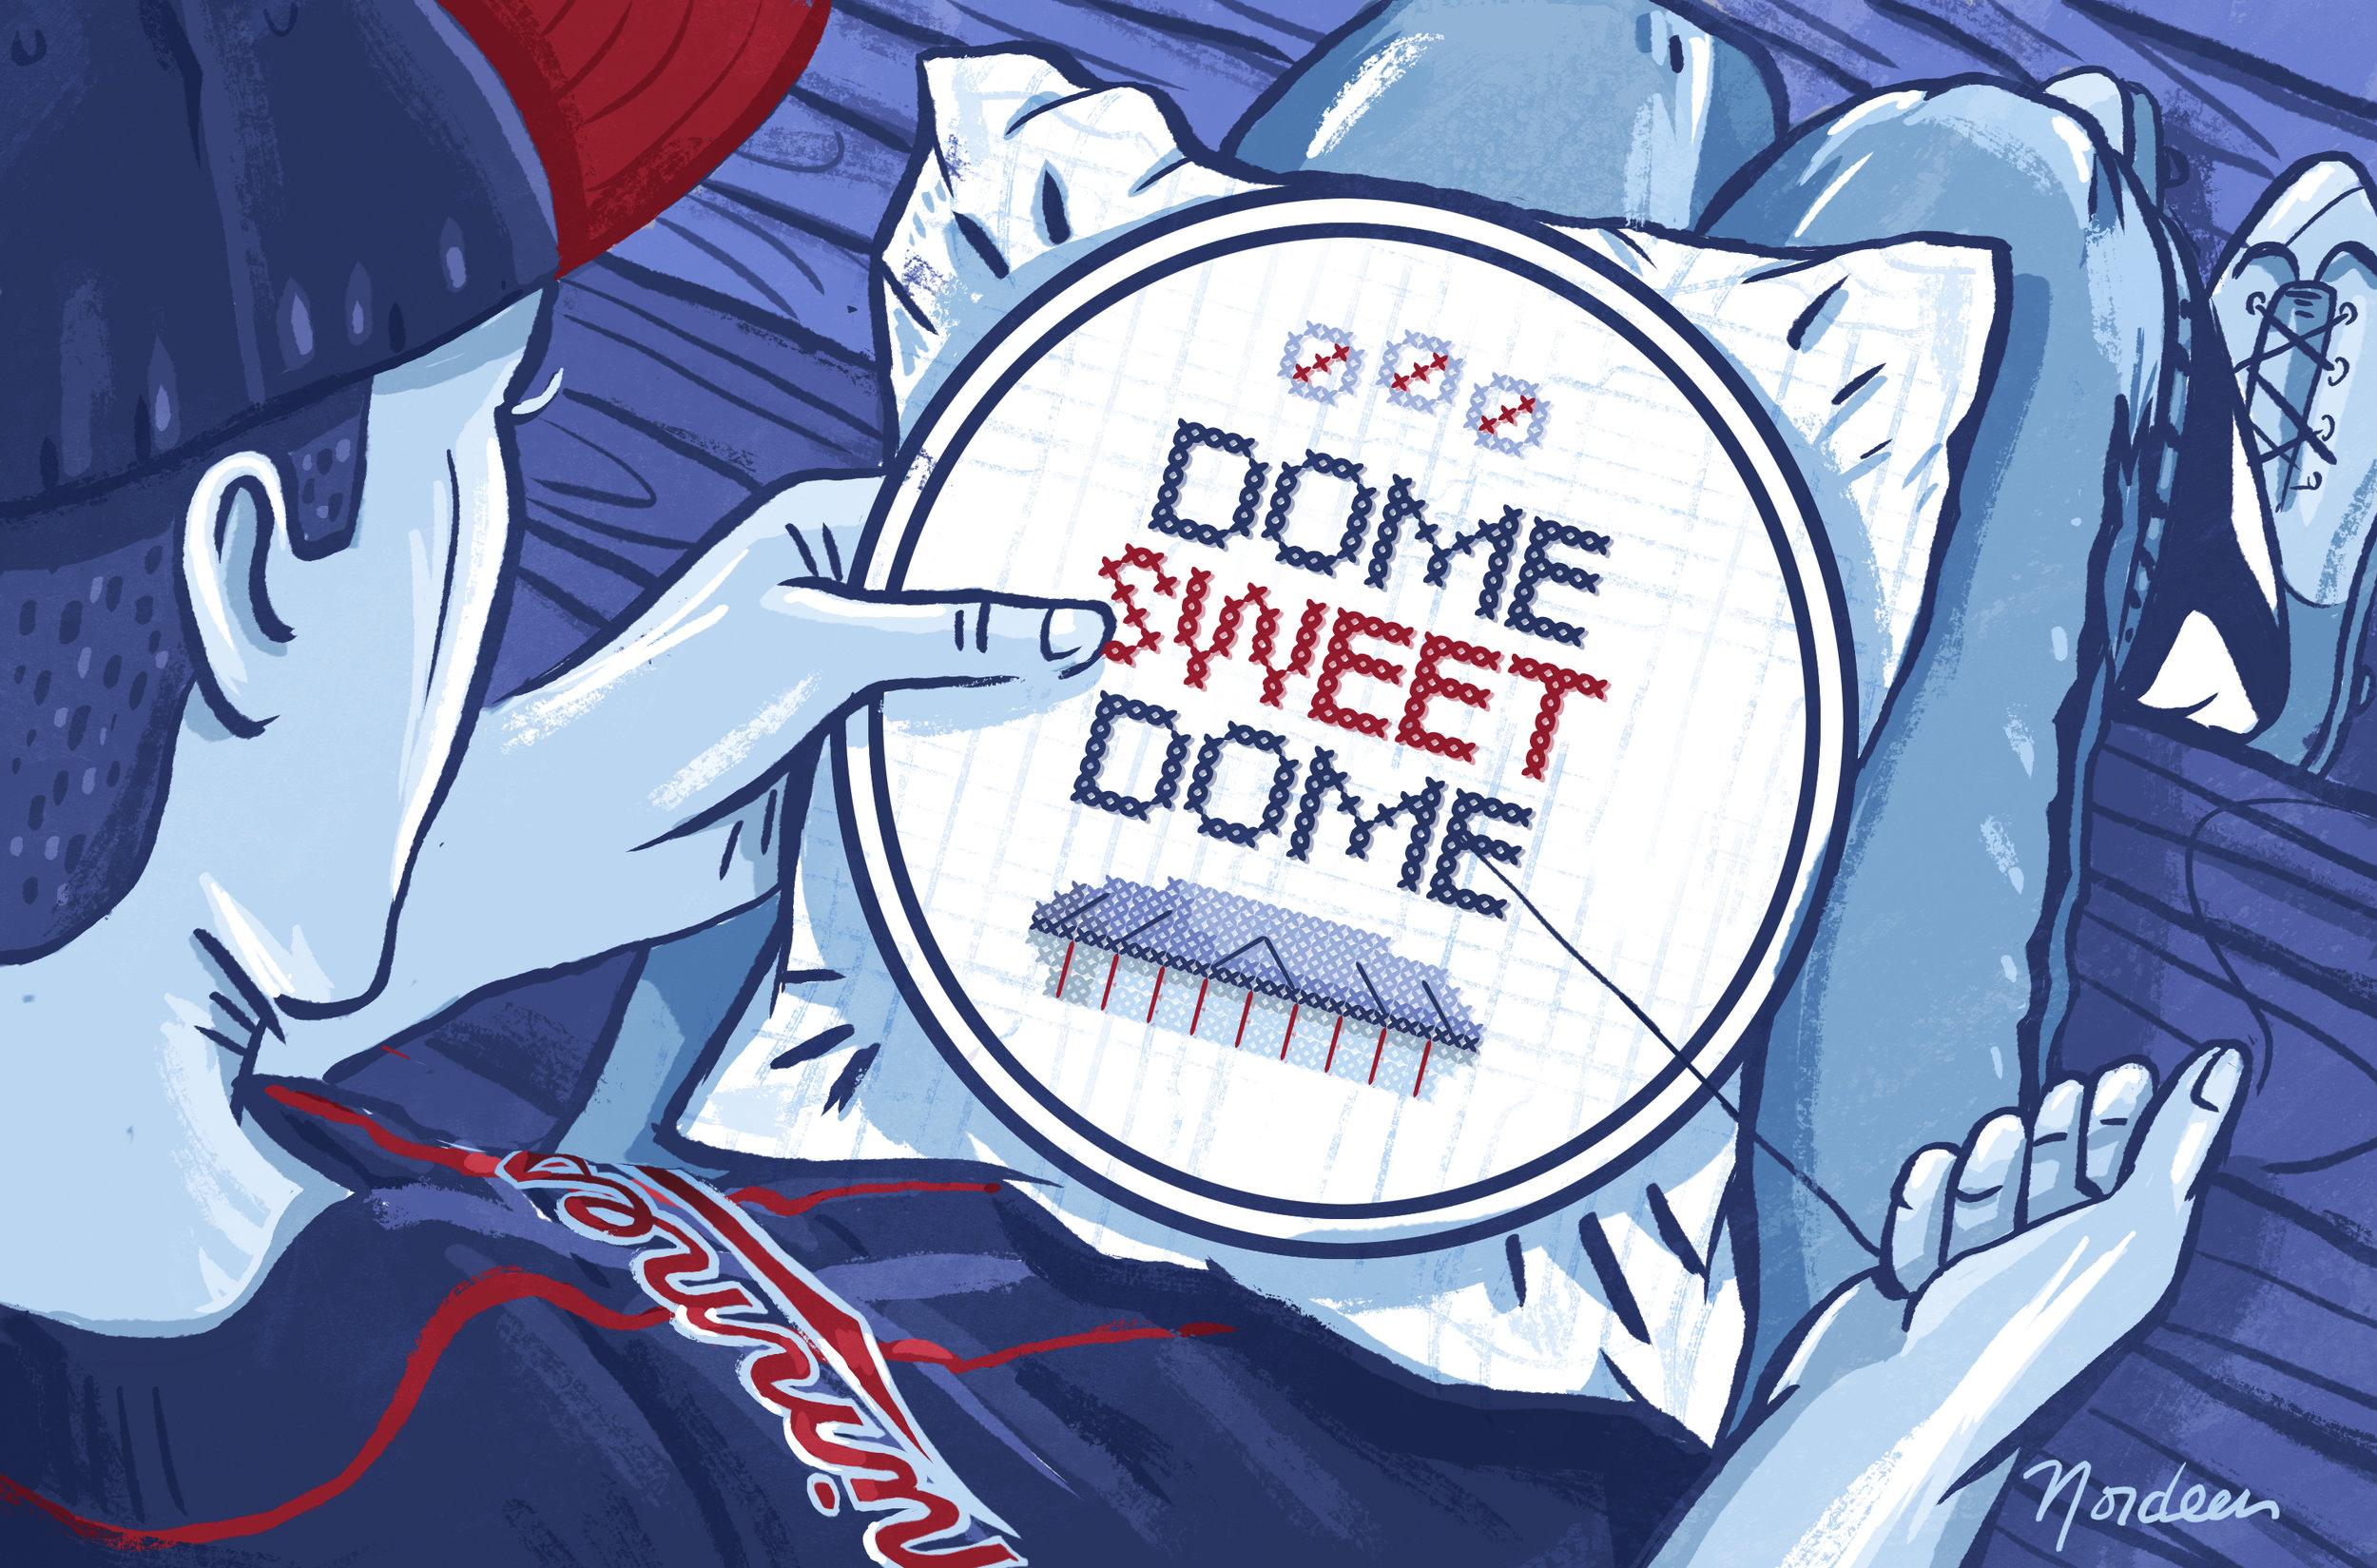 dome-sweet-dome_cnordeen_022719.jpg